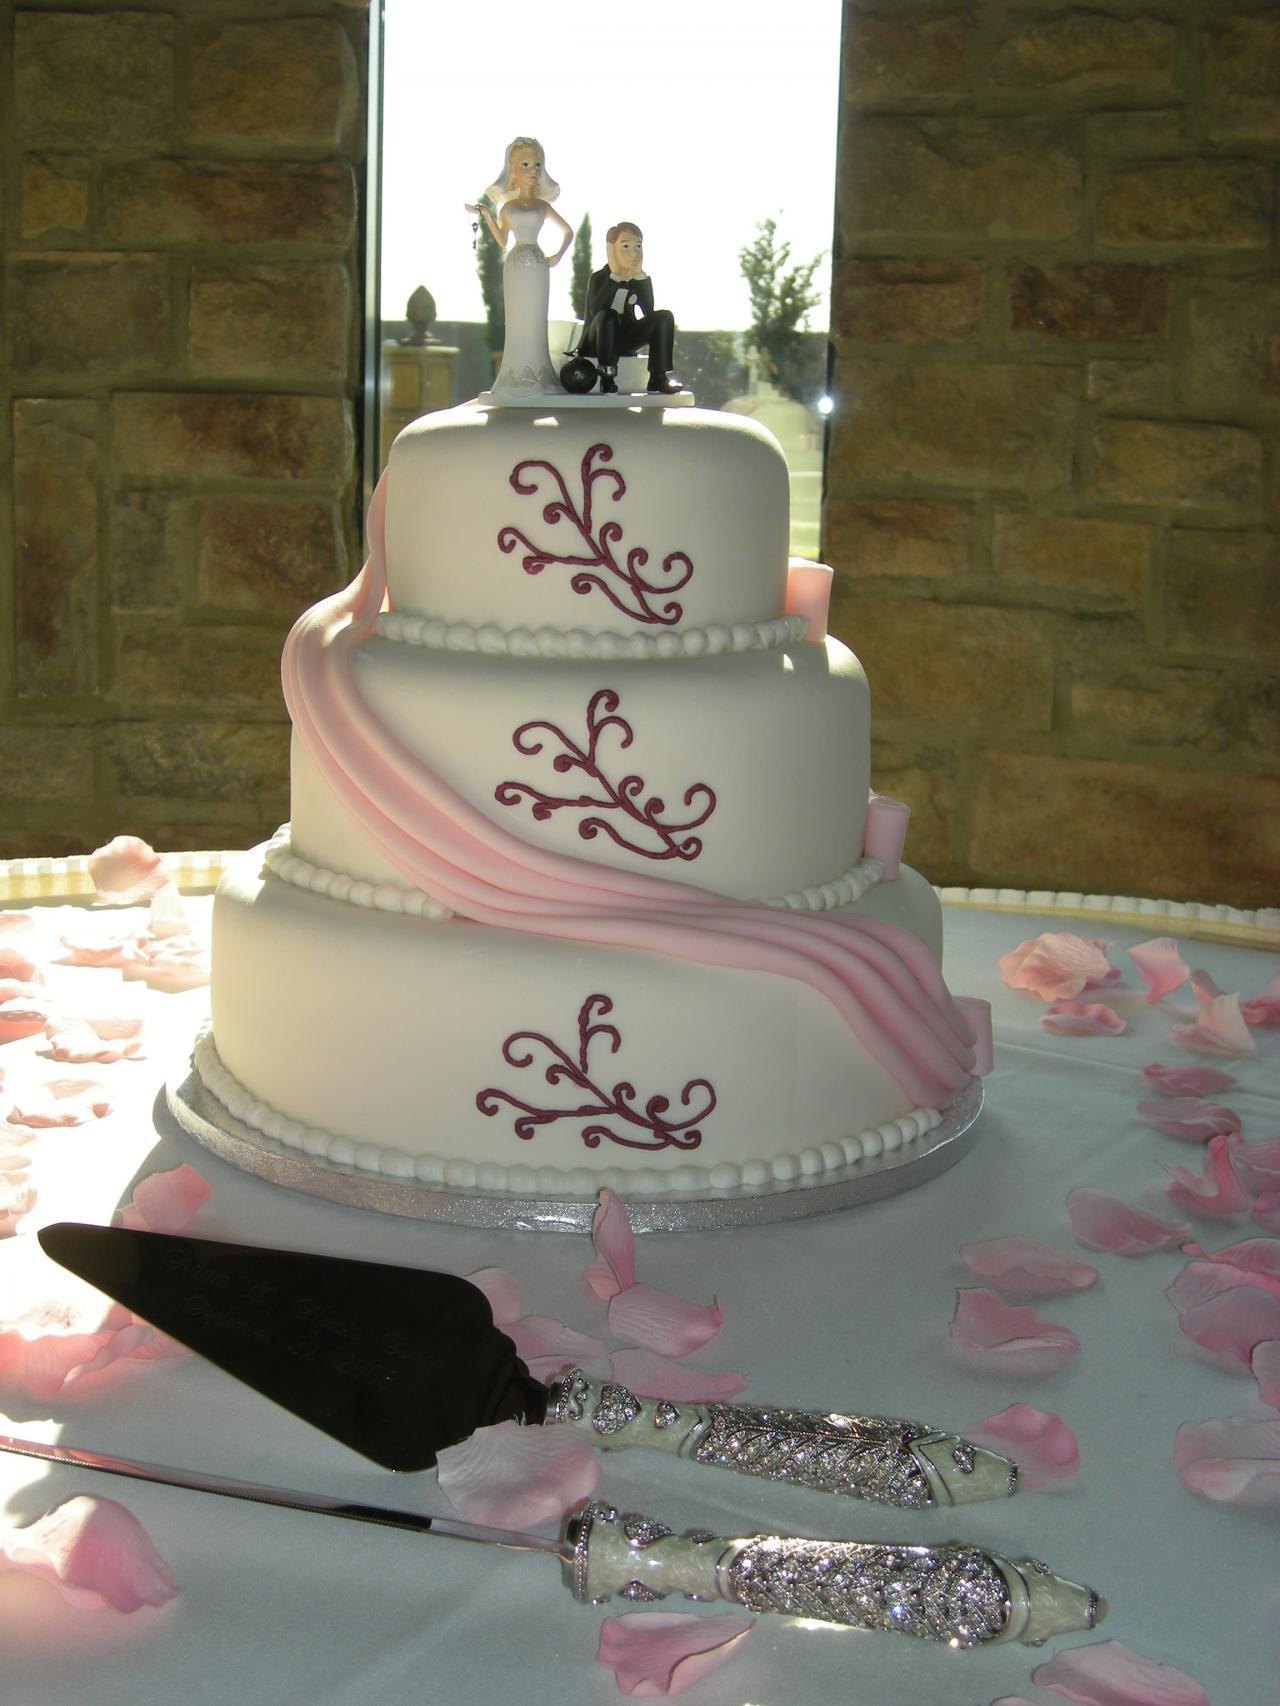 Wedding Cakes Galleries  My Goodness Cakes Wedding Cake Gallery 4